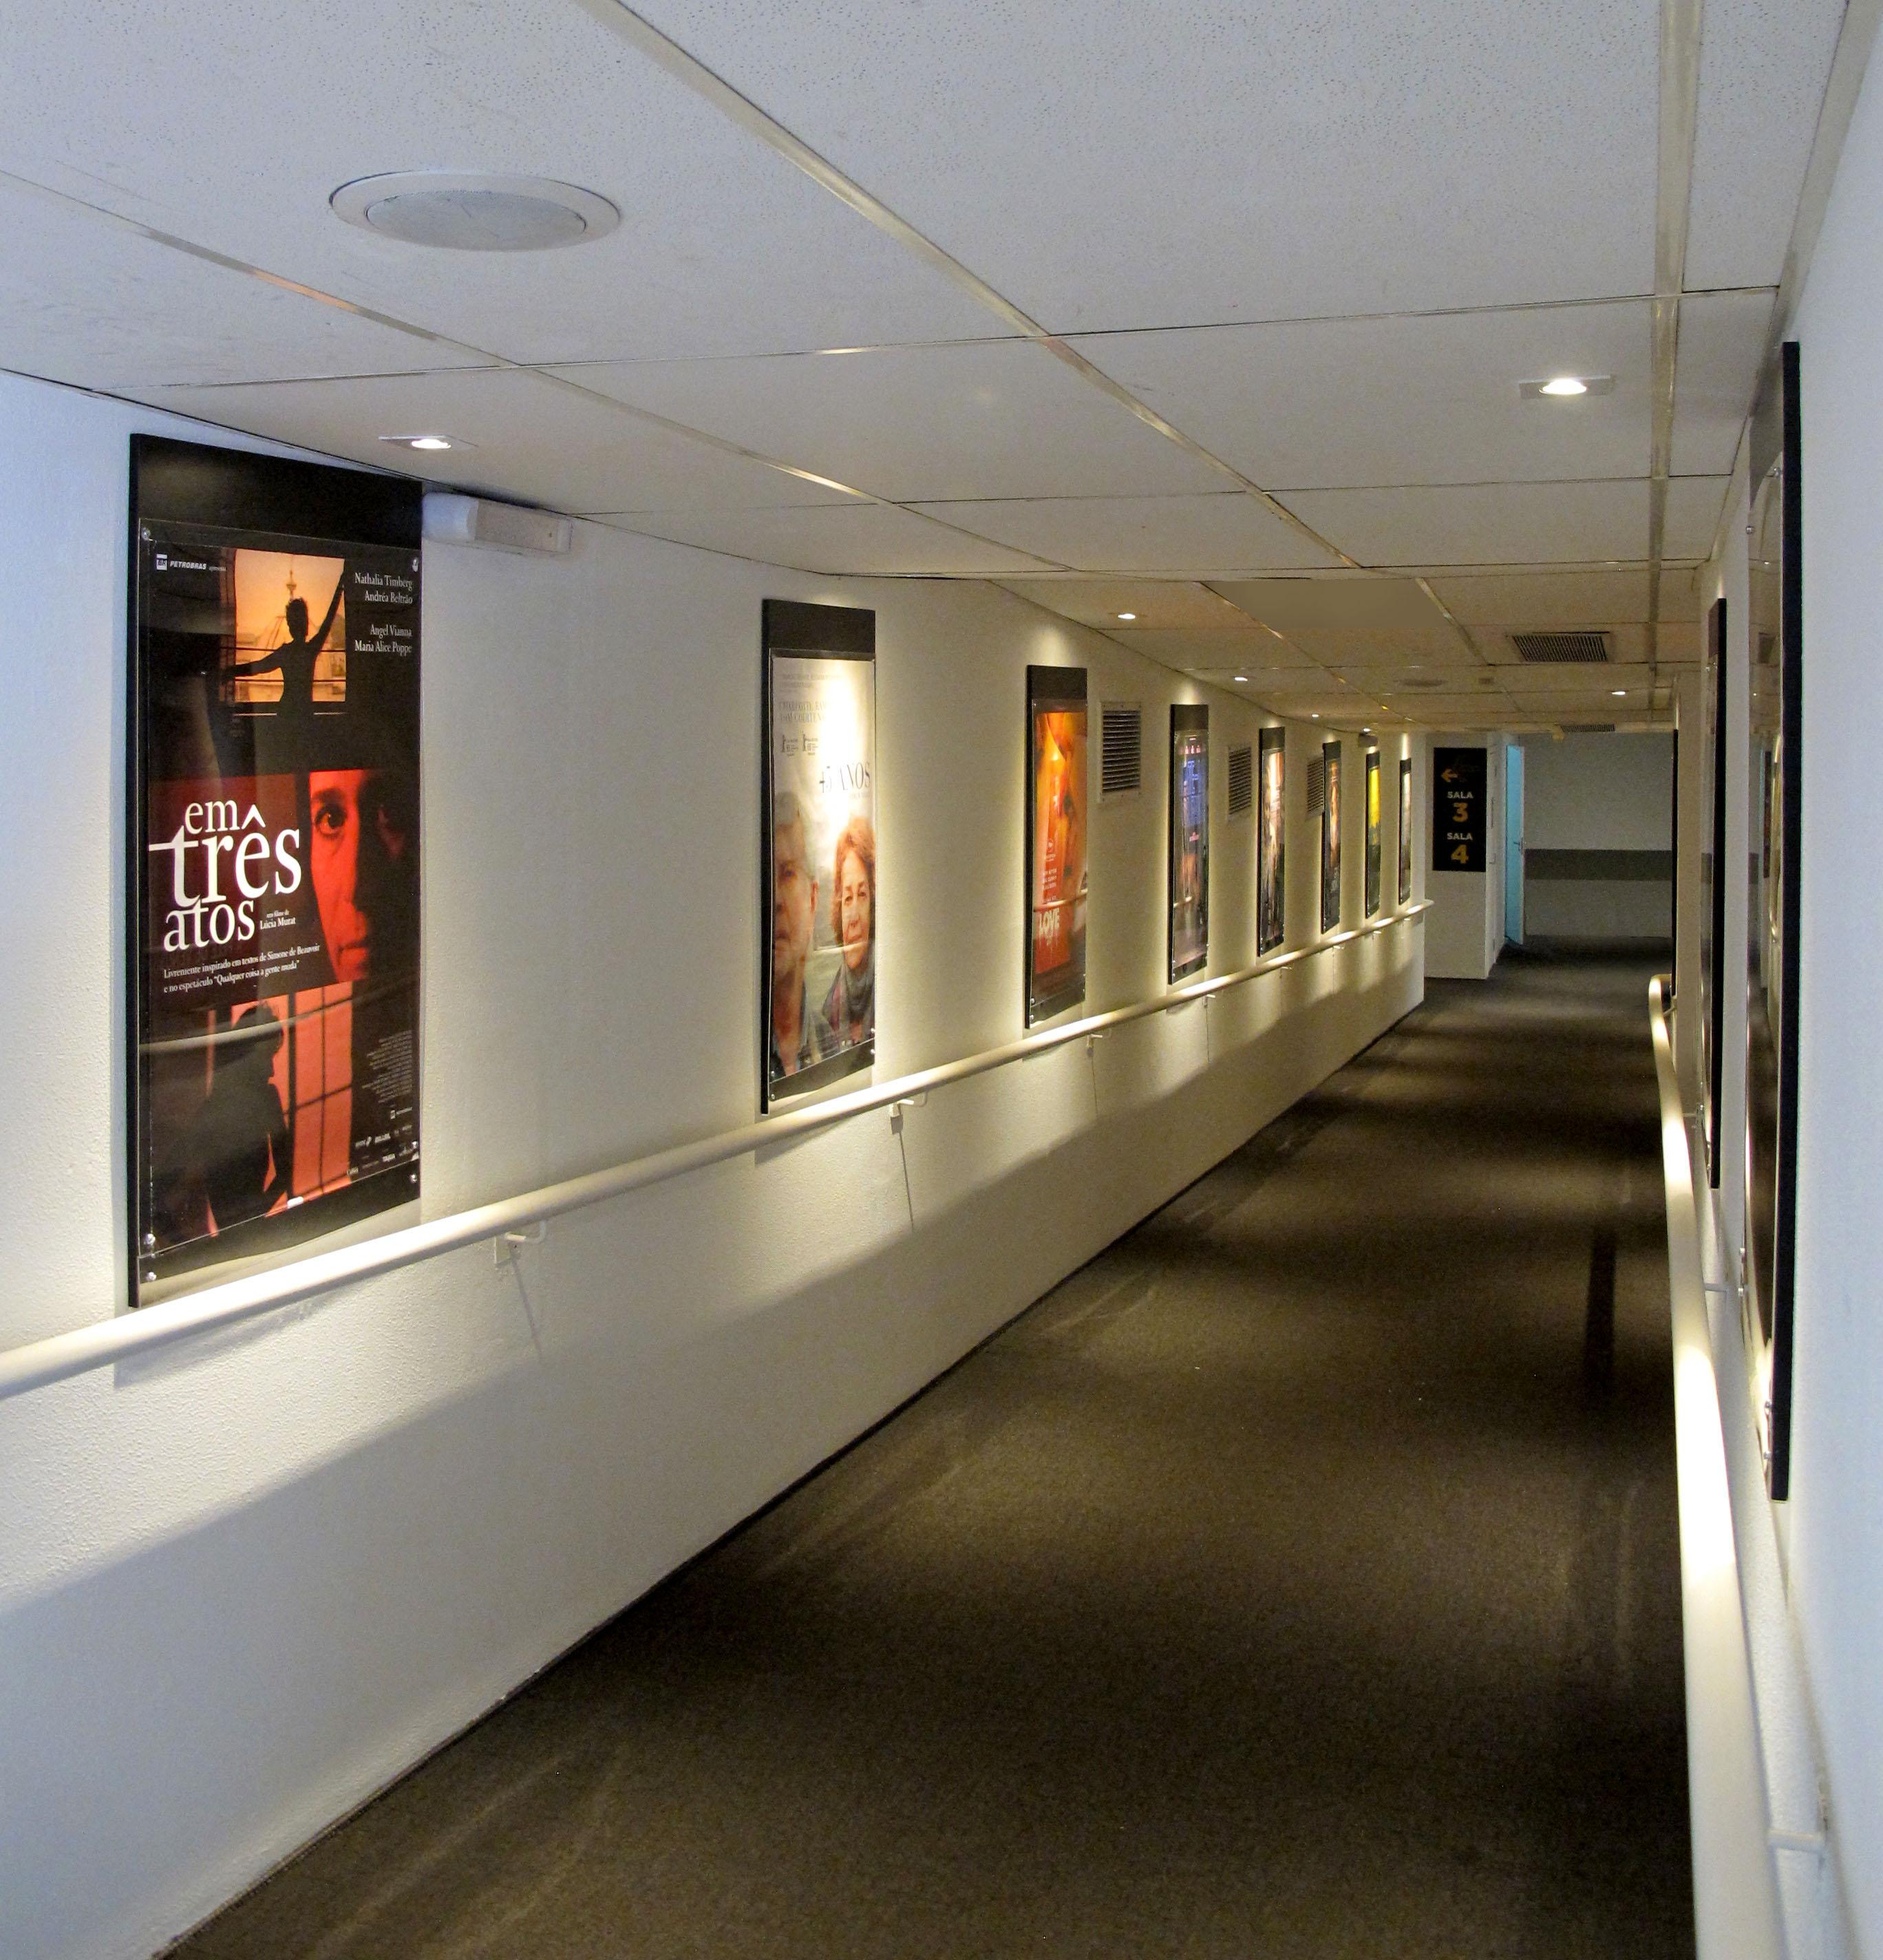 Circuito Cinema Sp : Cultura de suzano realiza circuito de cinema exposições e festas